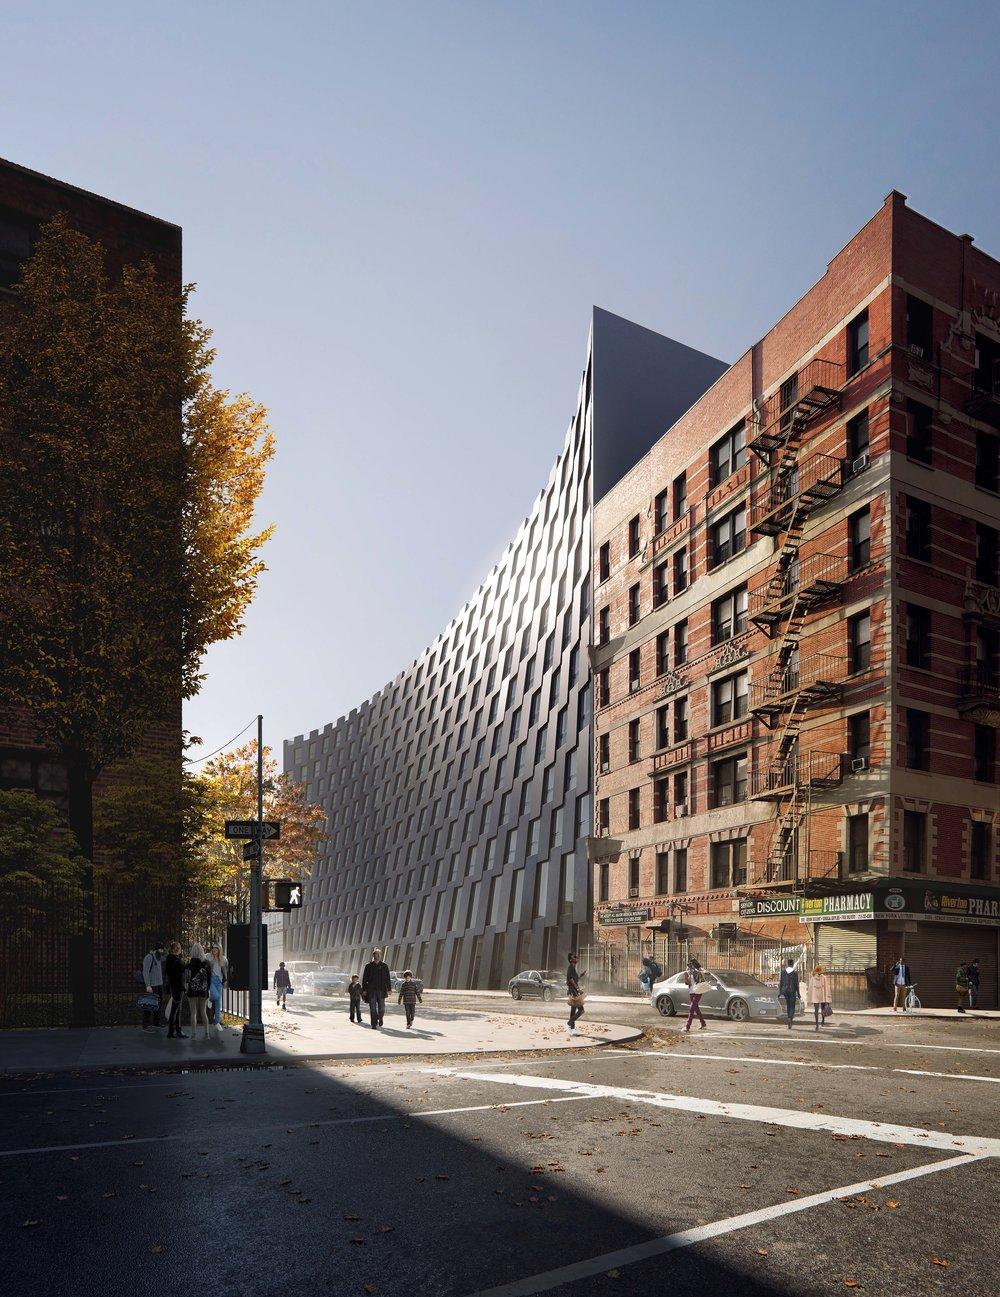 146 EAST 126th STREET - Harlem